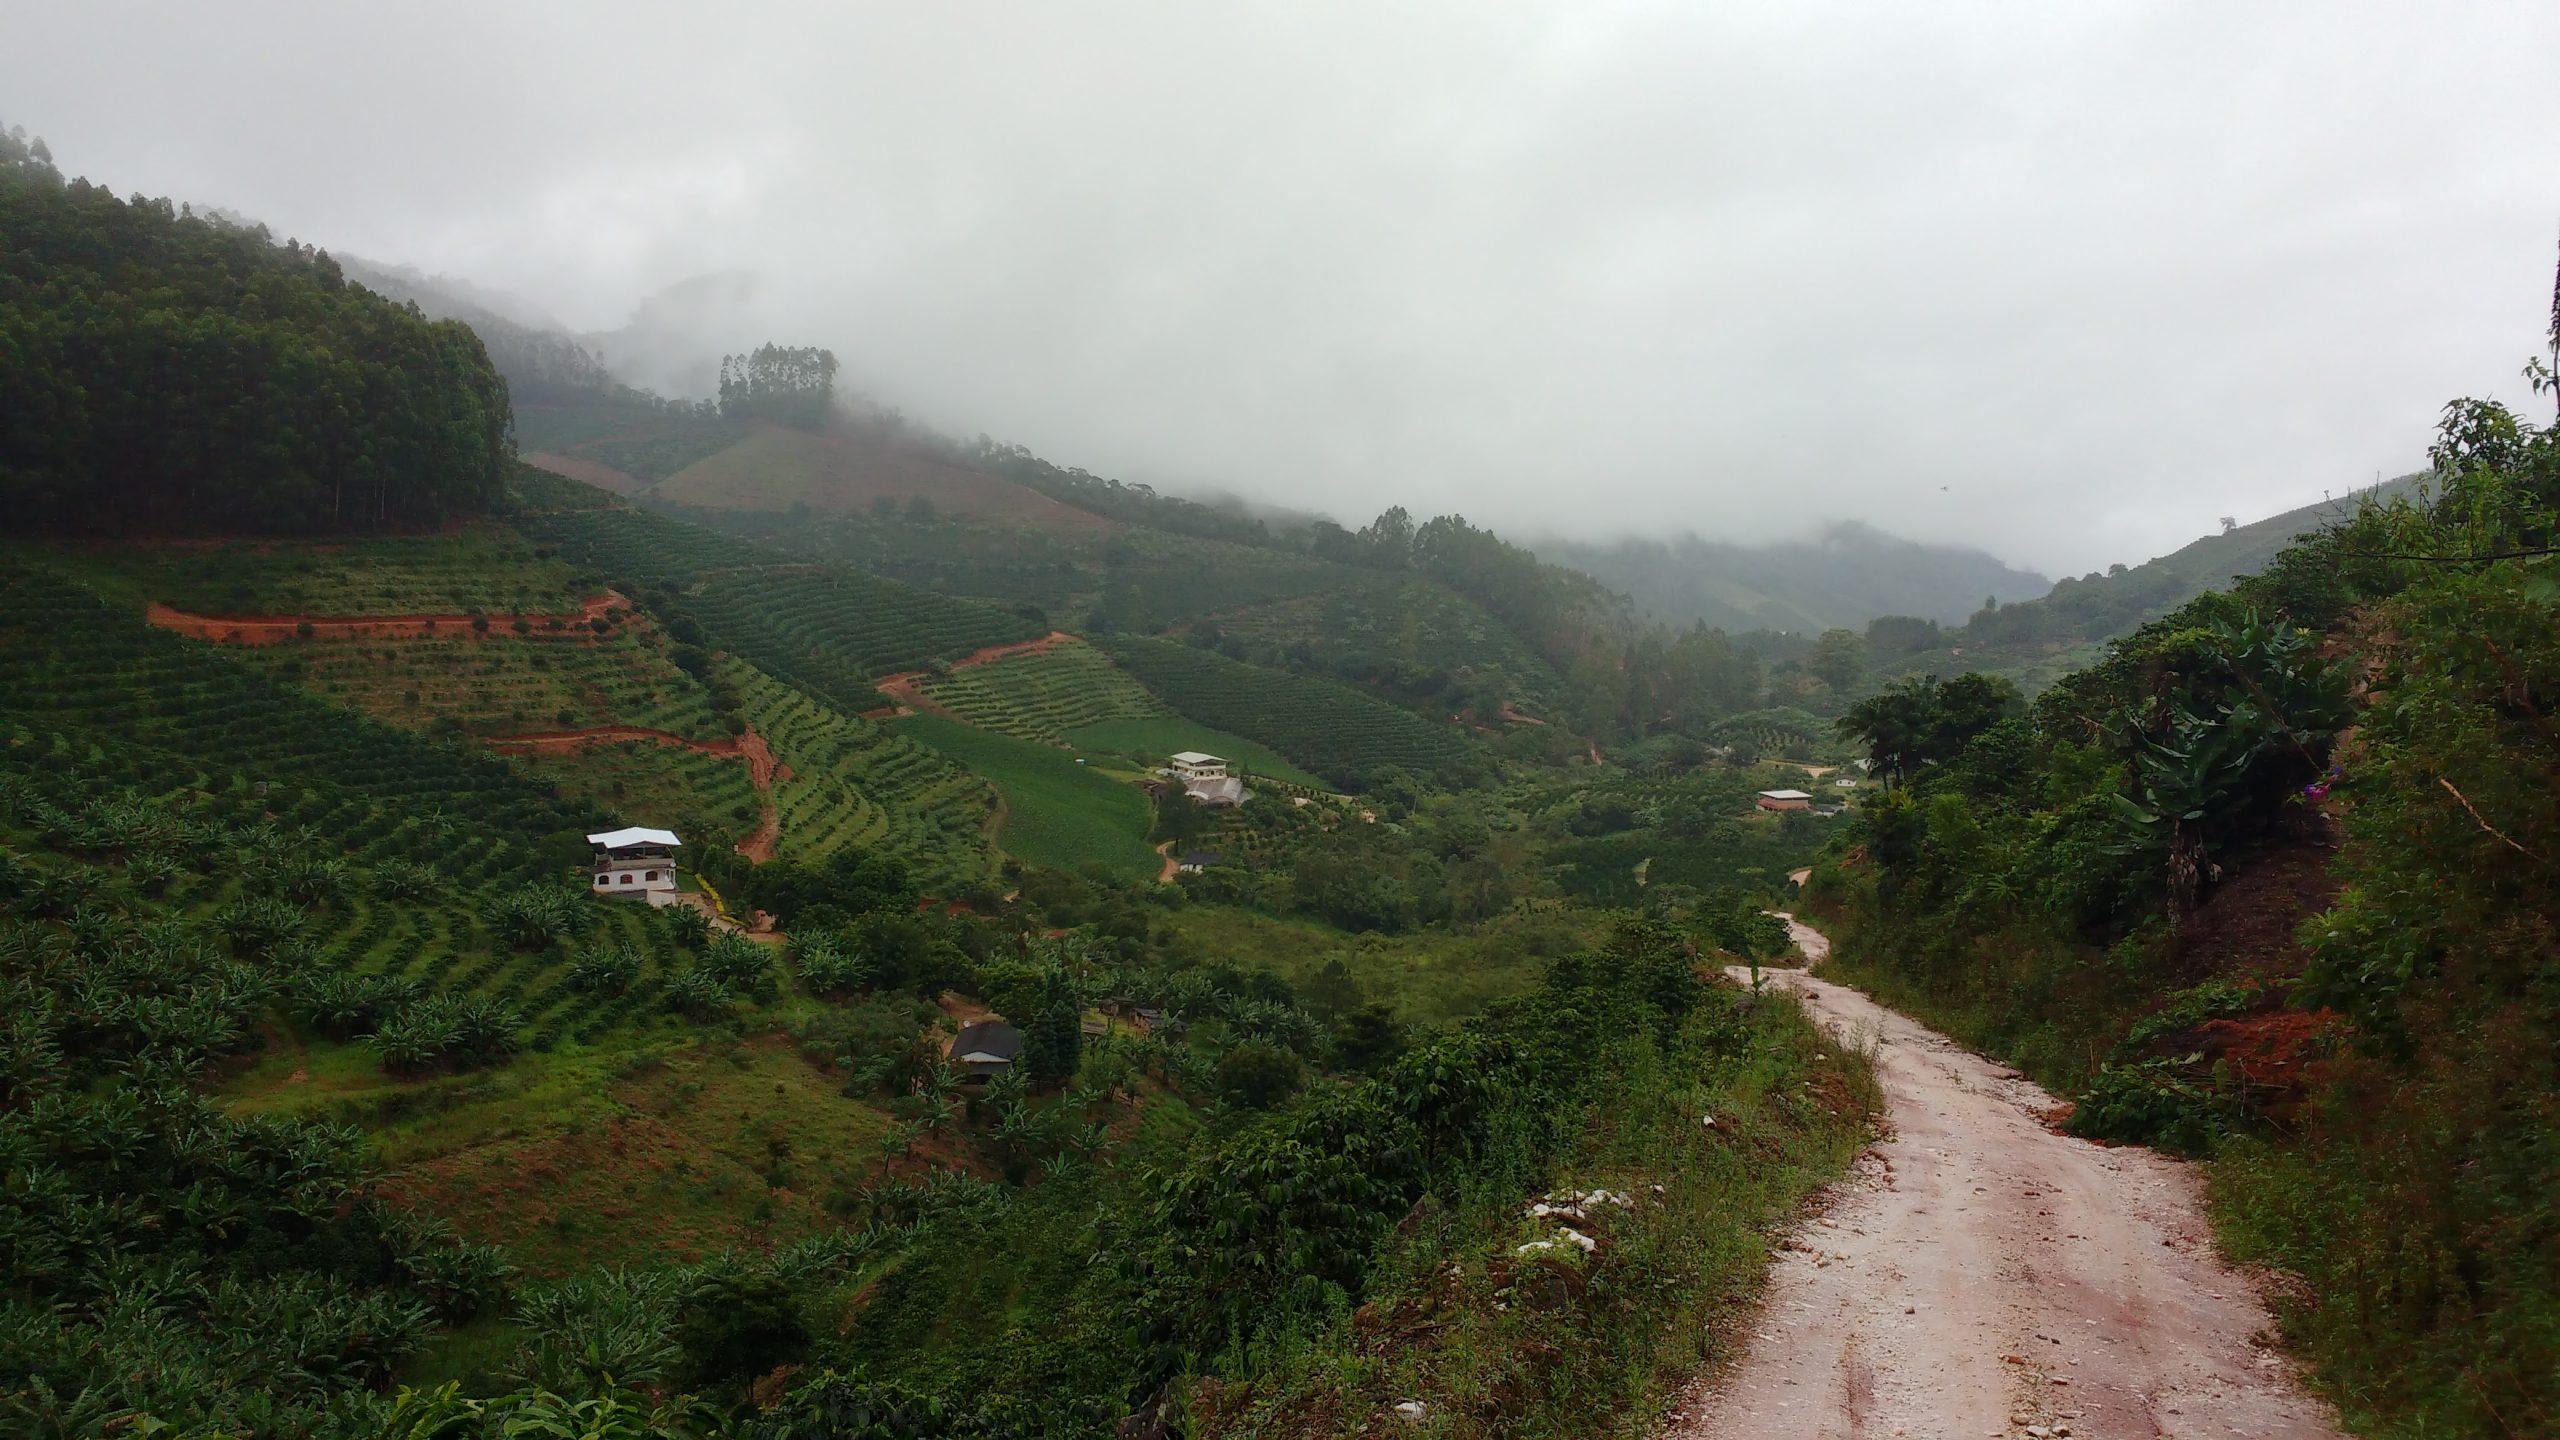 View of a fazenda in Brazil